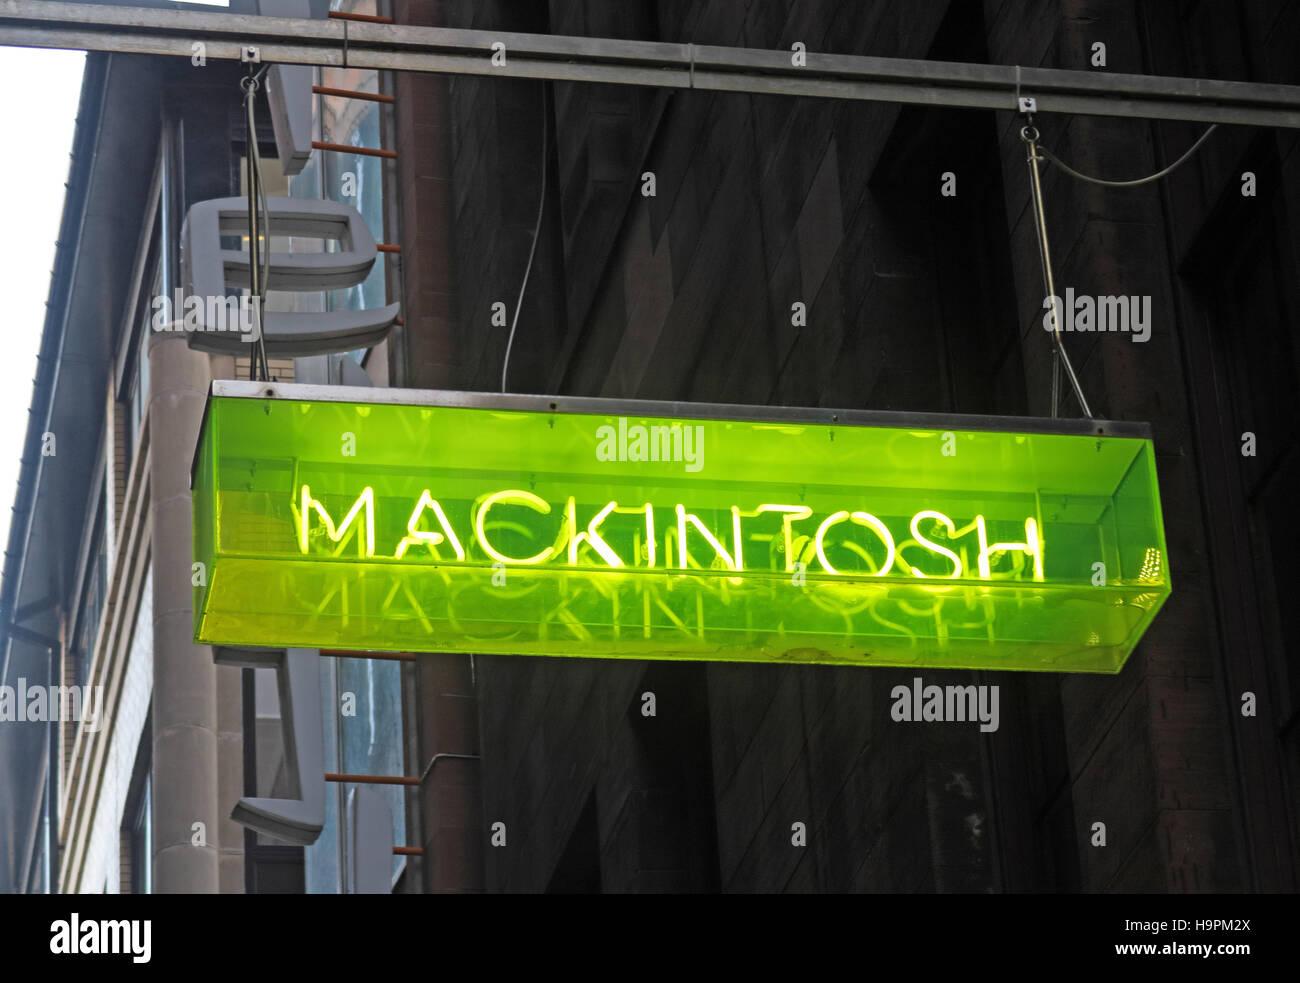 City,Centre,art,design,neon,sign,Glasgow,Scotland,UK,culture,architecture,G1,3NU,ln,tourist,tourism,travel,location,destination,designer,green,Neon Sign,The Lighthouse,Mitchell Lane,G1 3NU,Green Neon,GoTonySmith,@HotpixUK,Tony,Smith,UK,GB,Great,Britain,United,Kingdom,Scottish,Scots,British,Scotland,Buy Pictures of,Buy Images Of,Images of,Stock Images,Tony Smith,United Kingdom,Great Britain,British Isles,Charles Rennie Mackintosh,Rennie Mackintosh,Glasgow School,The Glasgow School